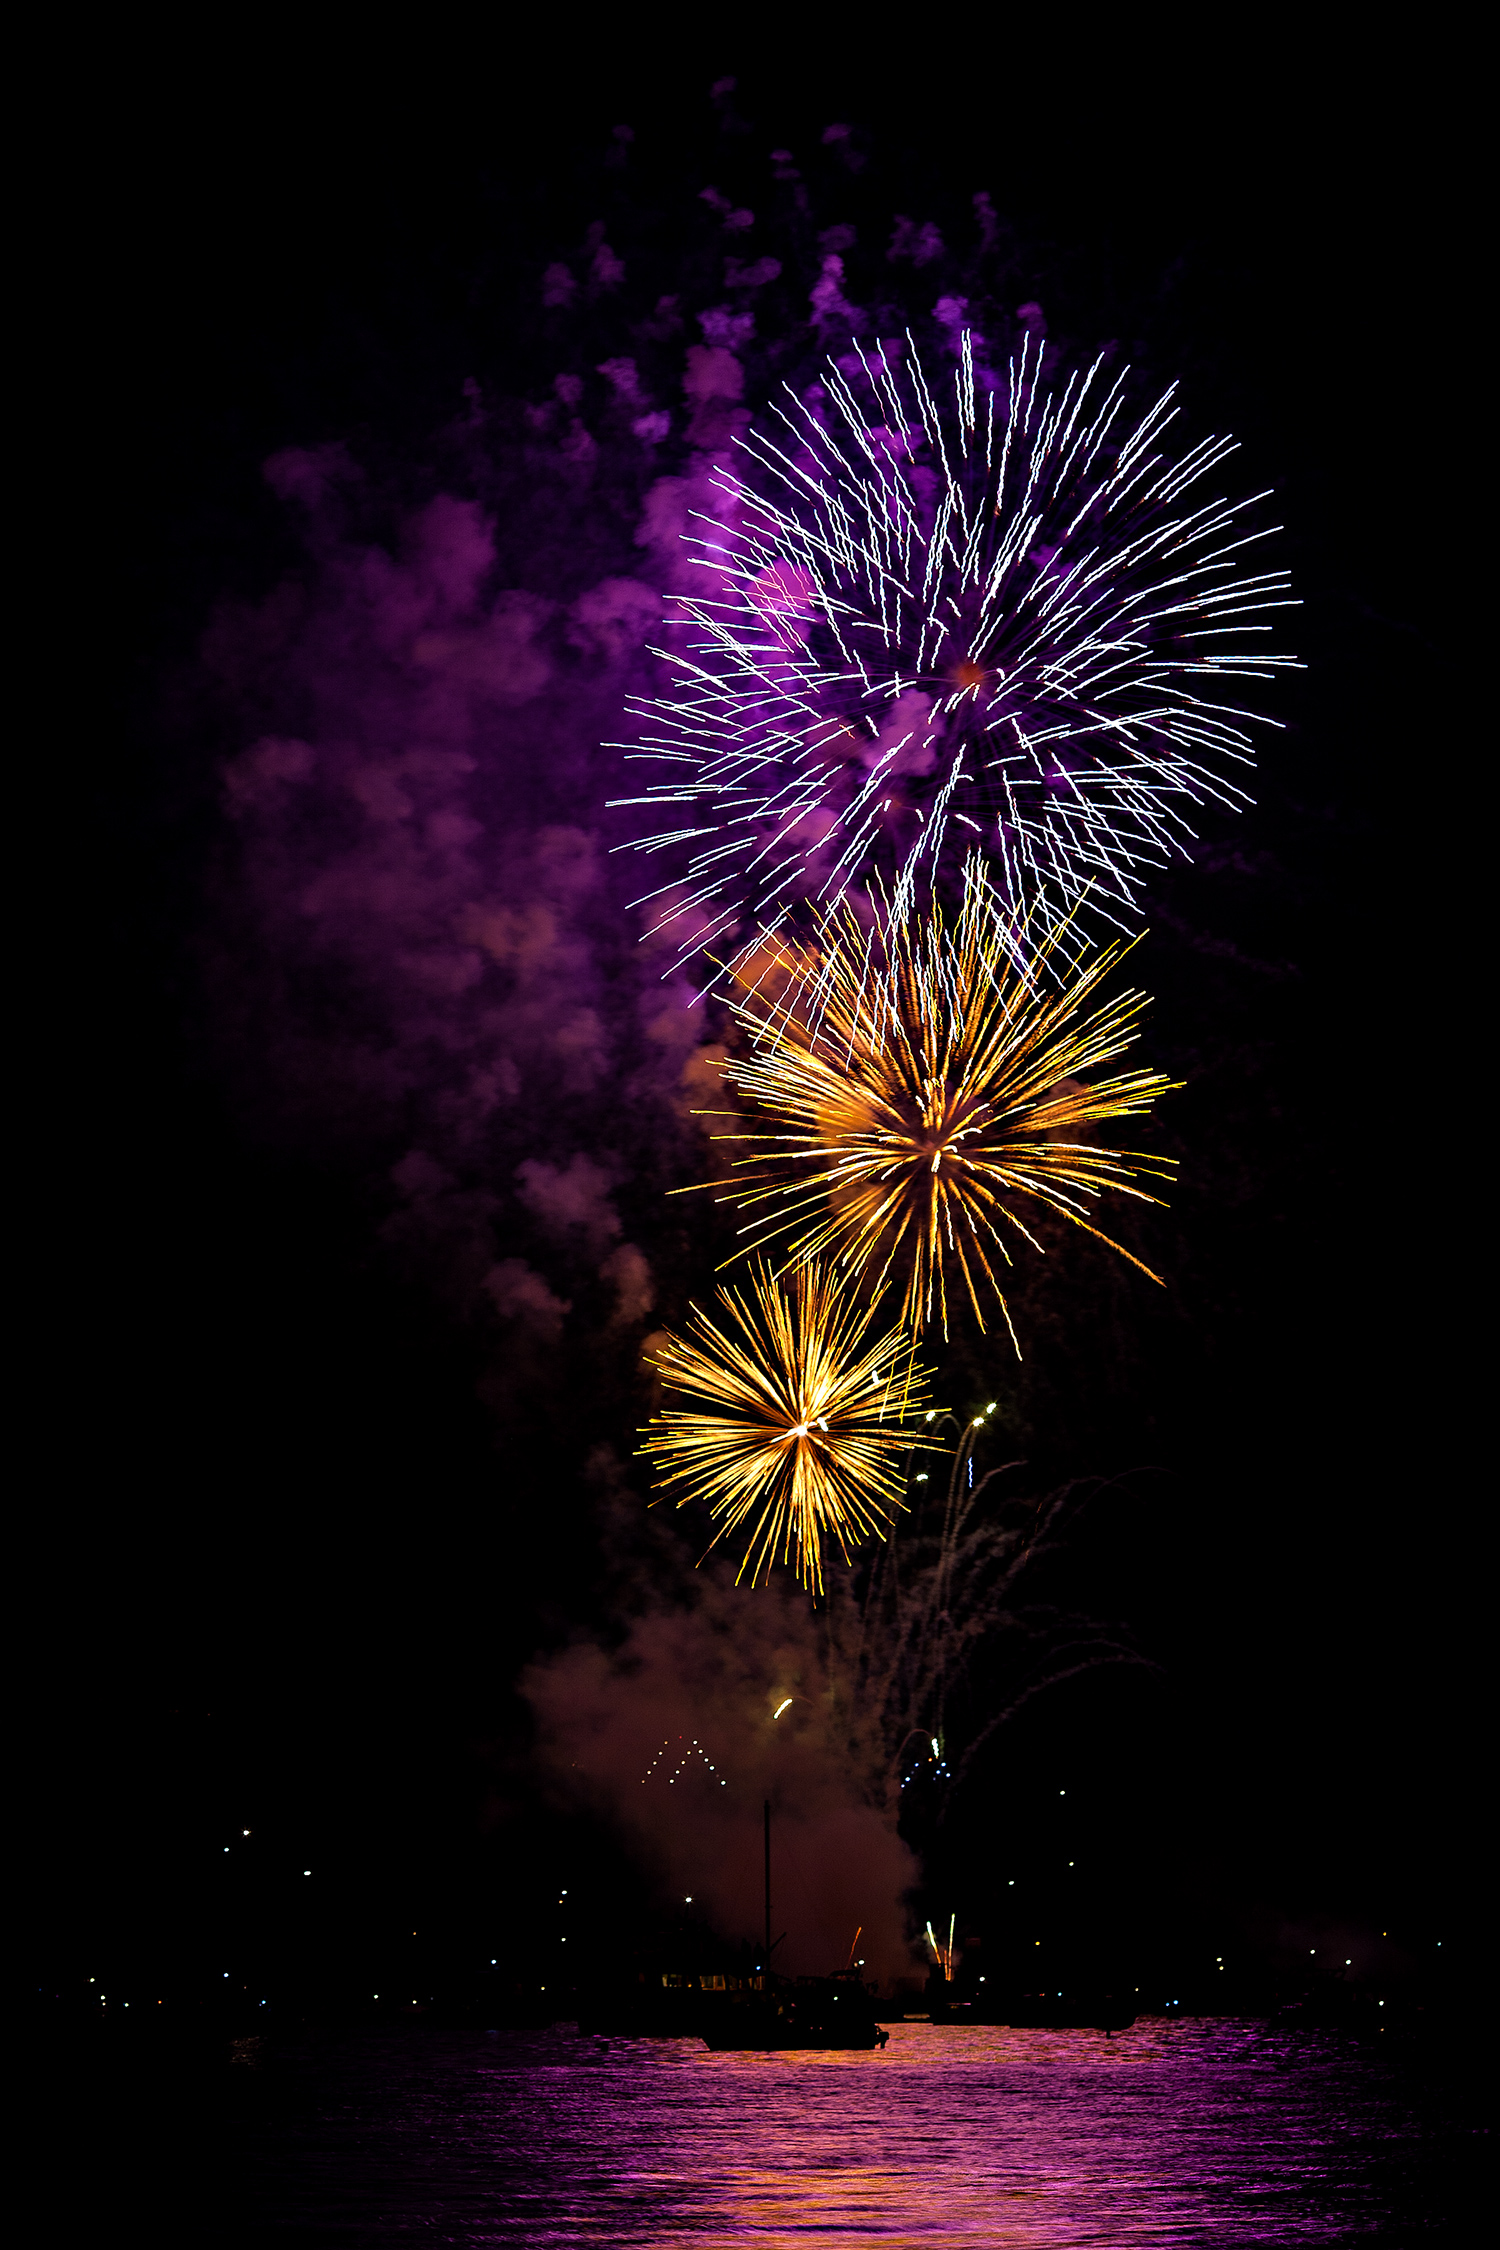 Fireworks from Kitsilano Beach, Vancouver, British Columbia, Canada